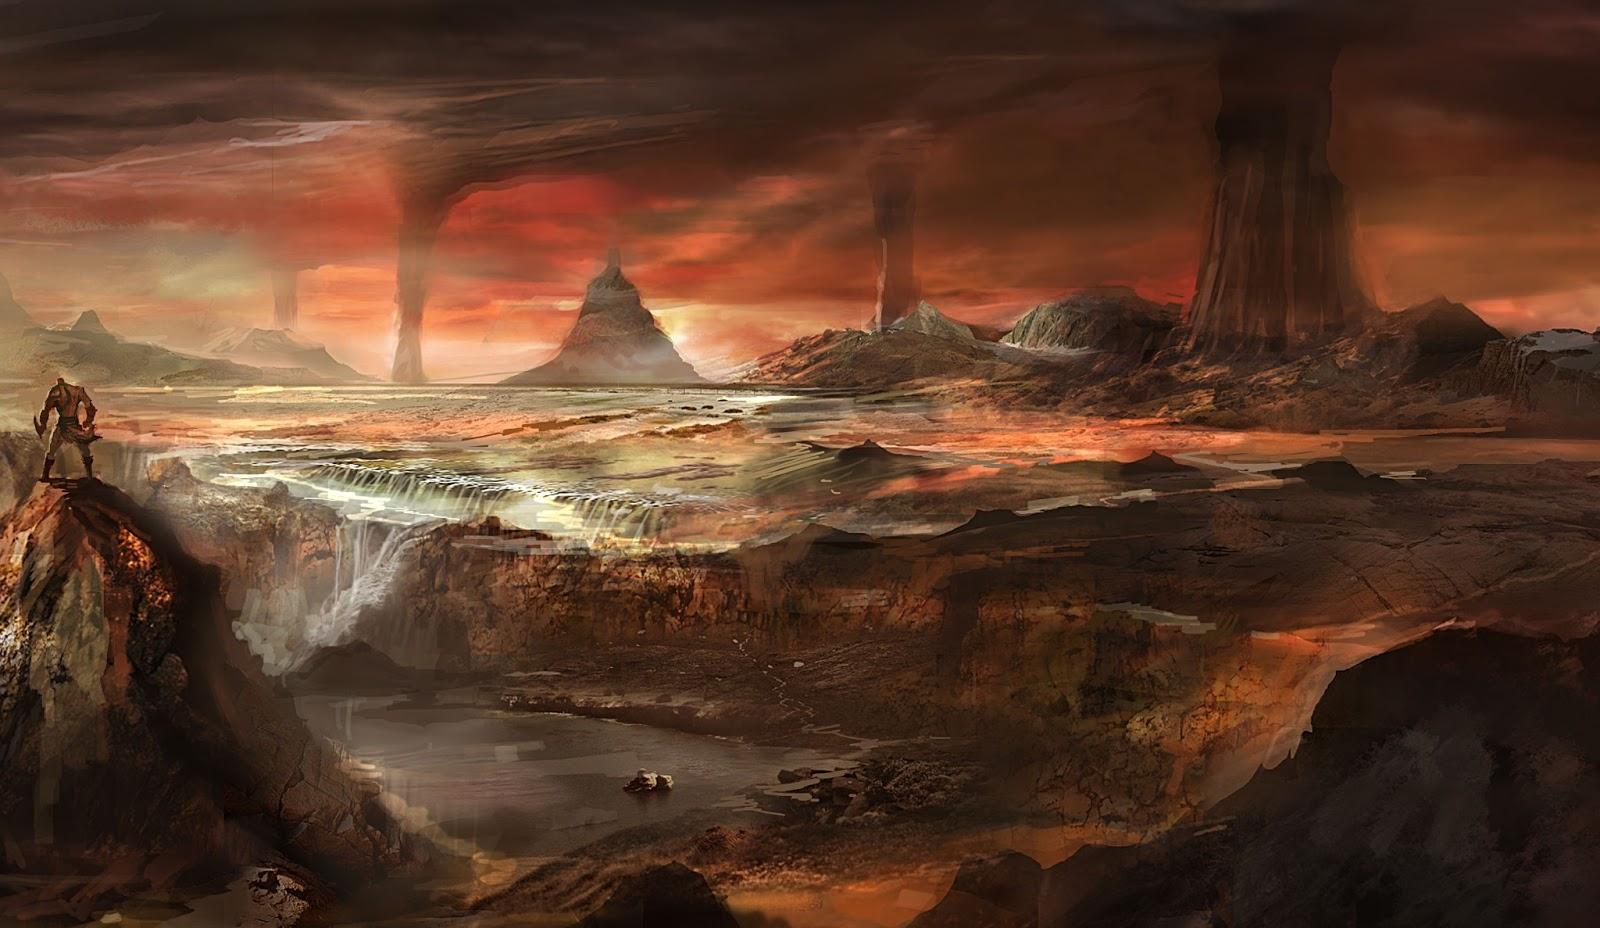 The Underworld (location)